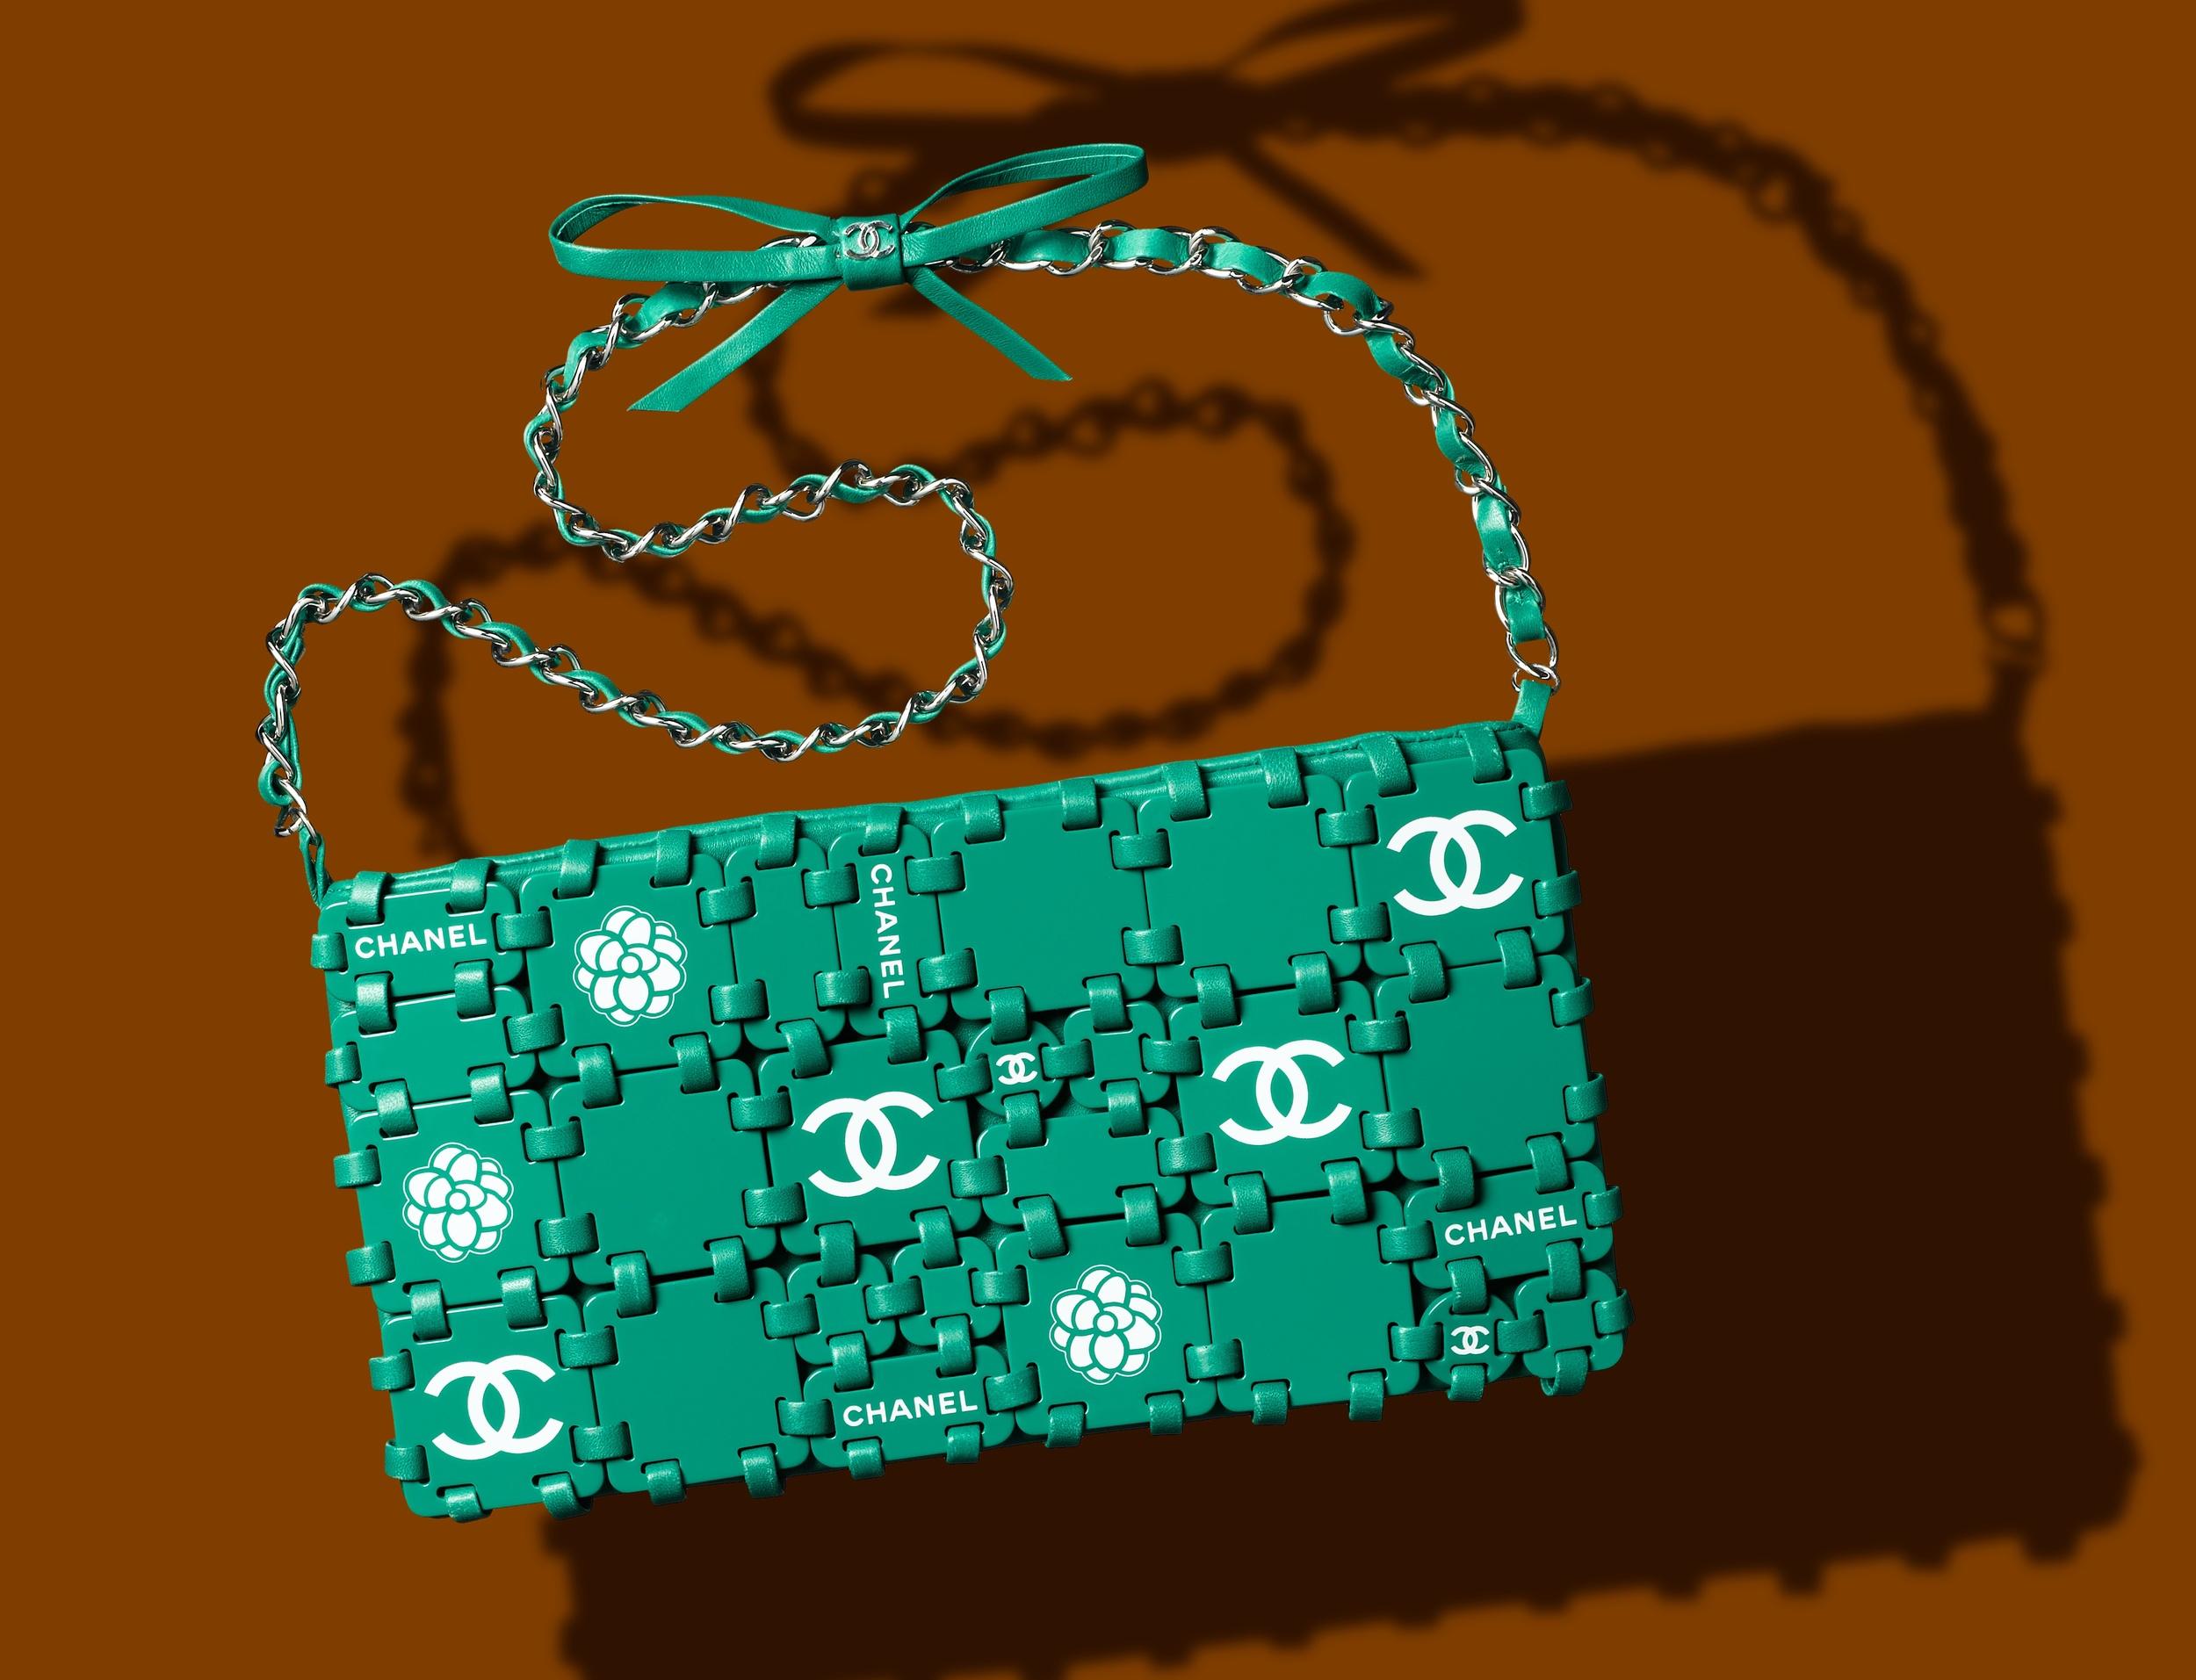 CHANEL puzzle bag.jpg